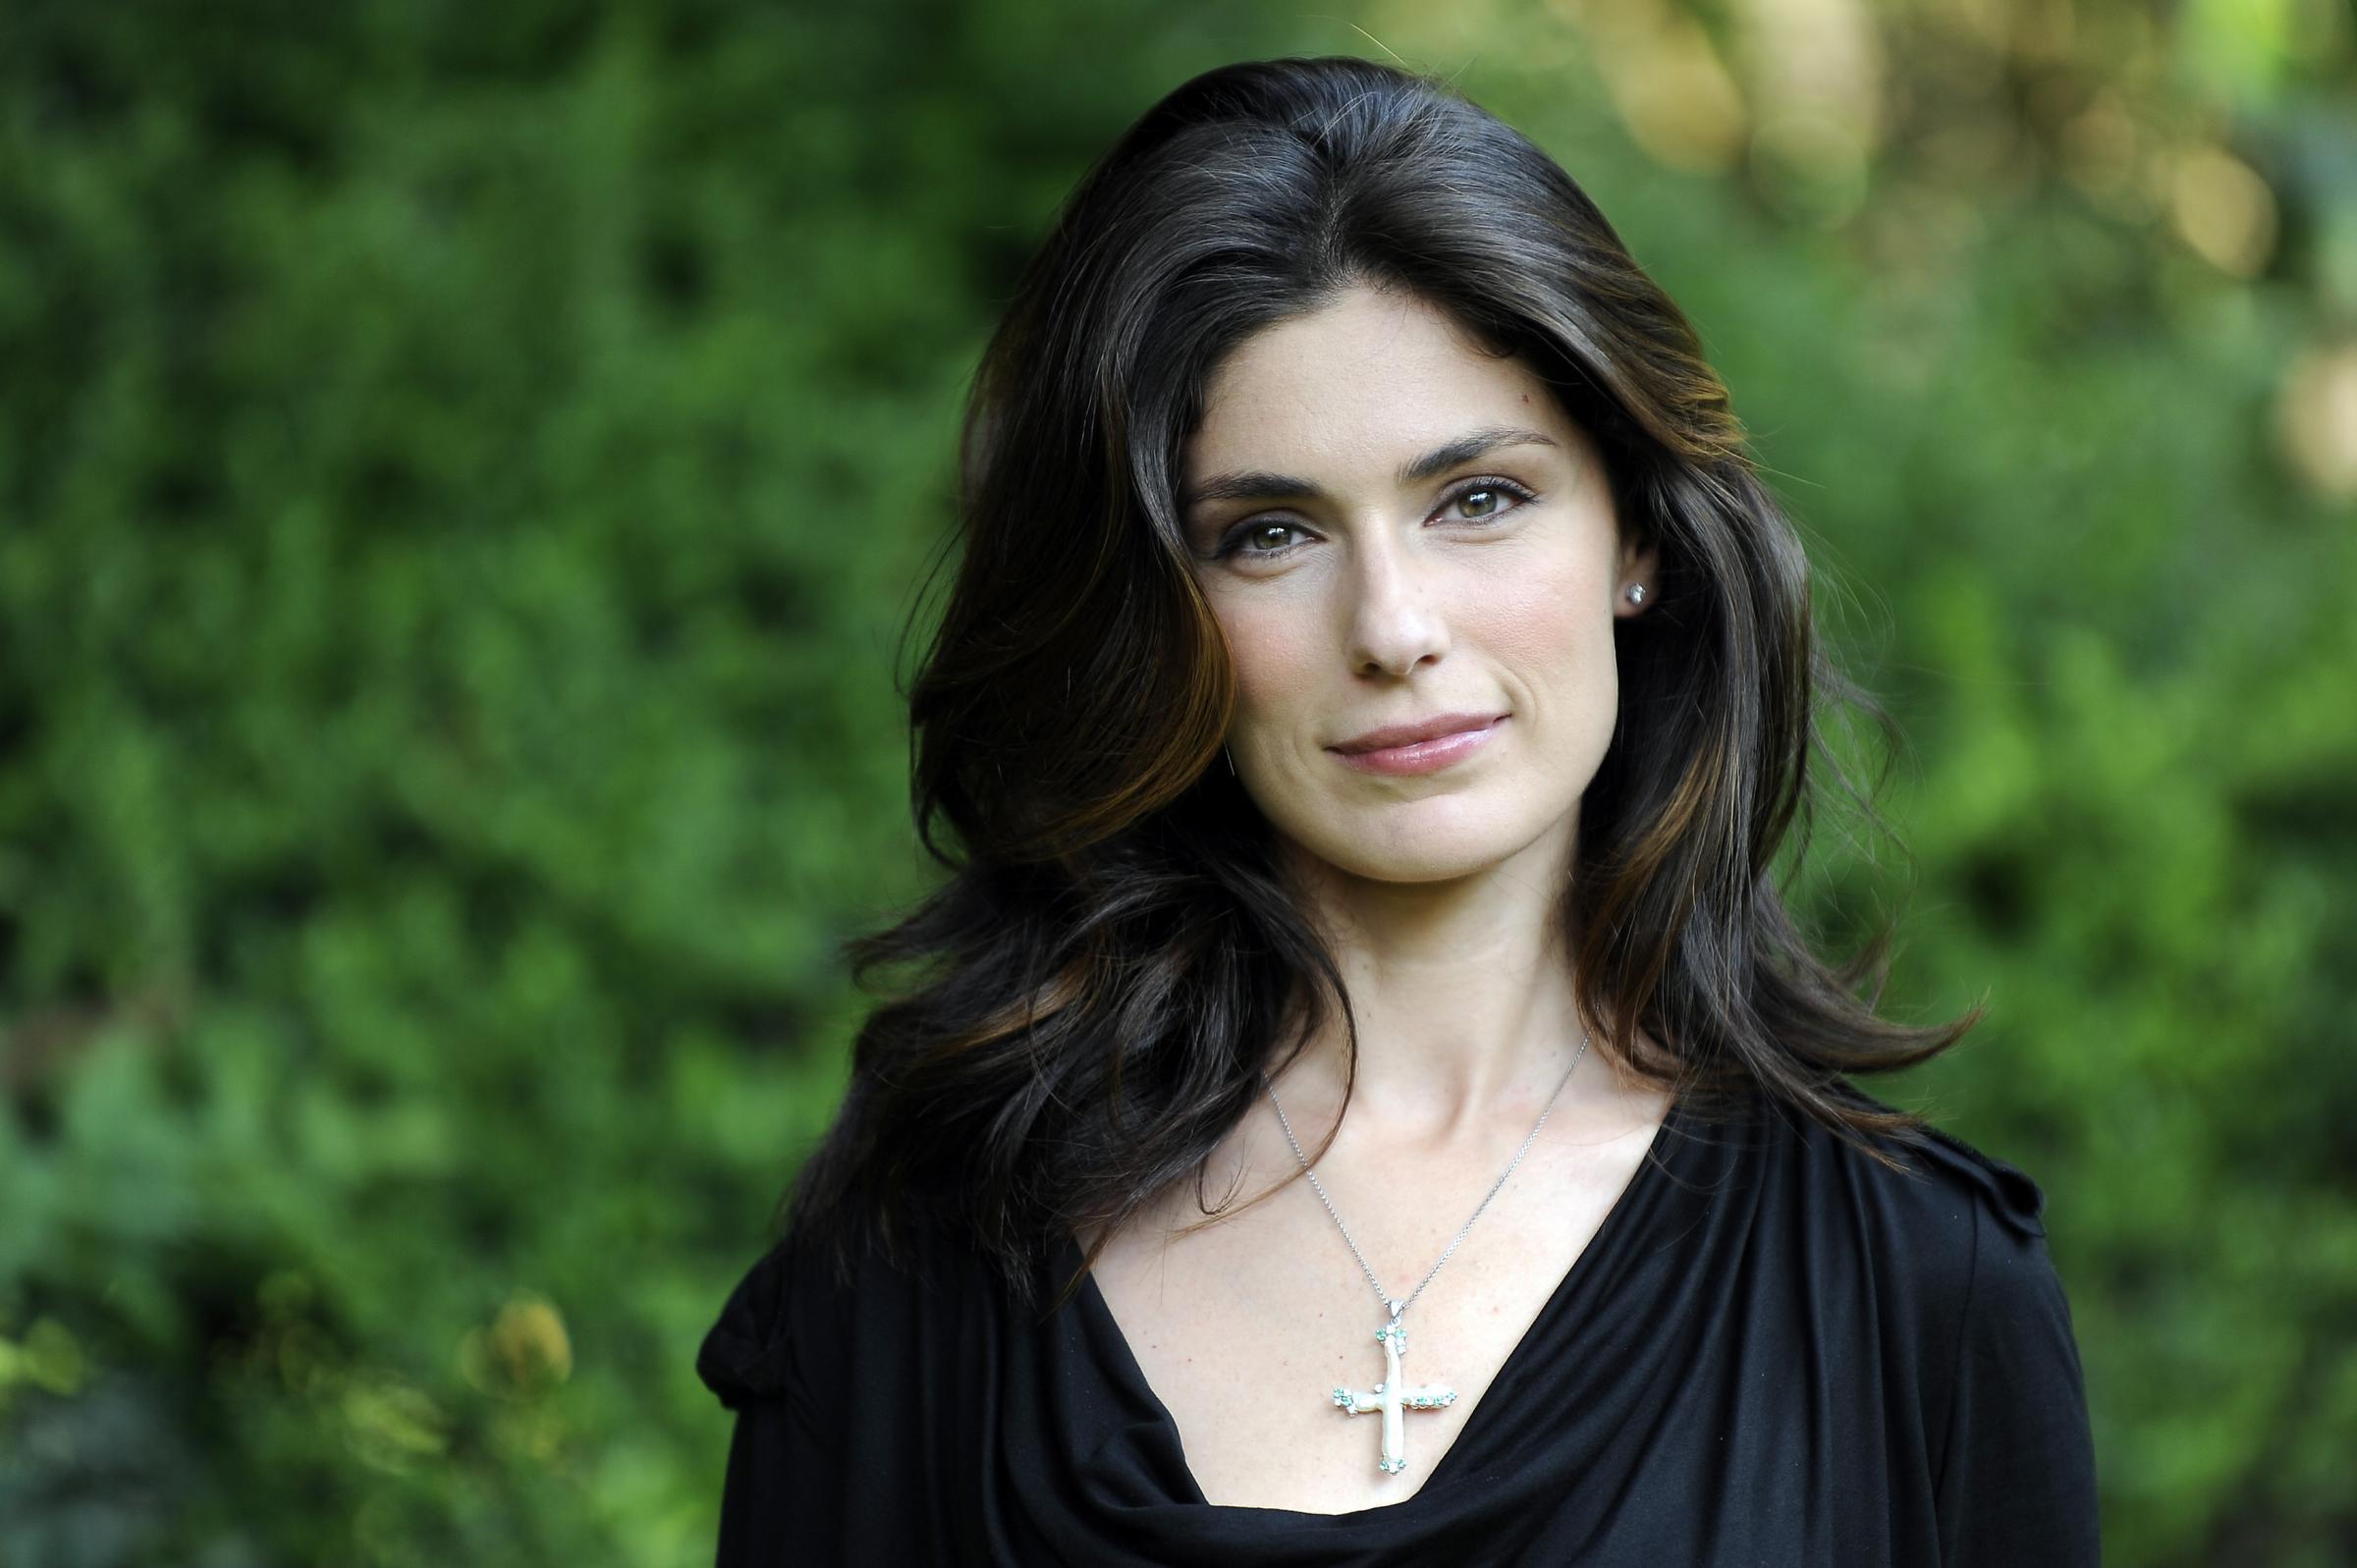 Anna valle incinta e in felice non ho l 39 istinto materno - Les plus belles douches italiennes ...